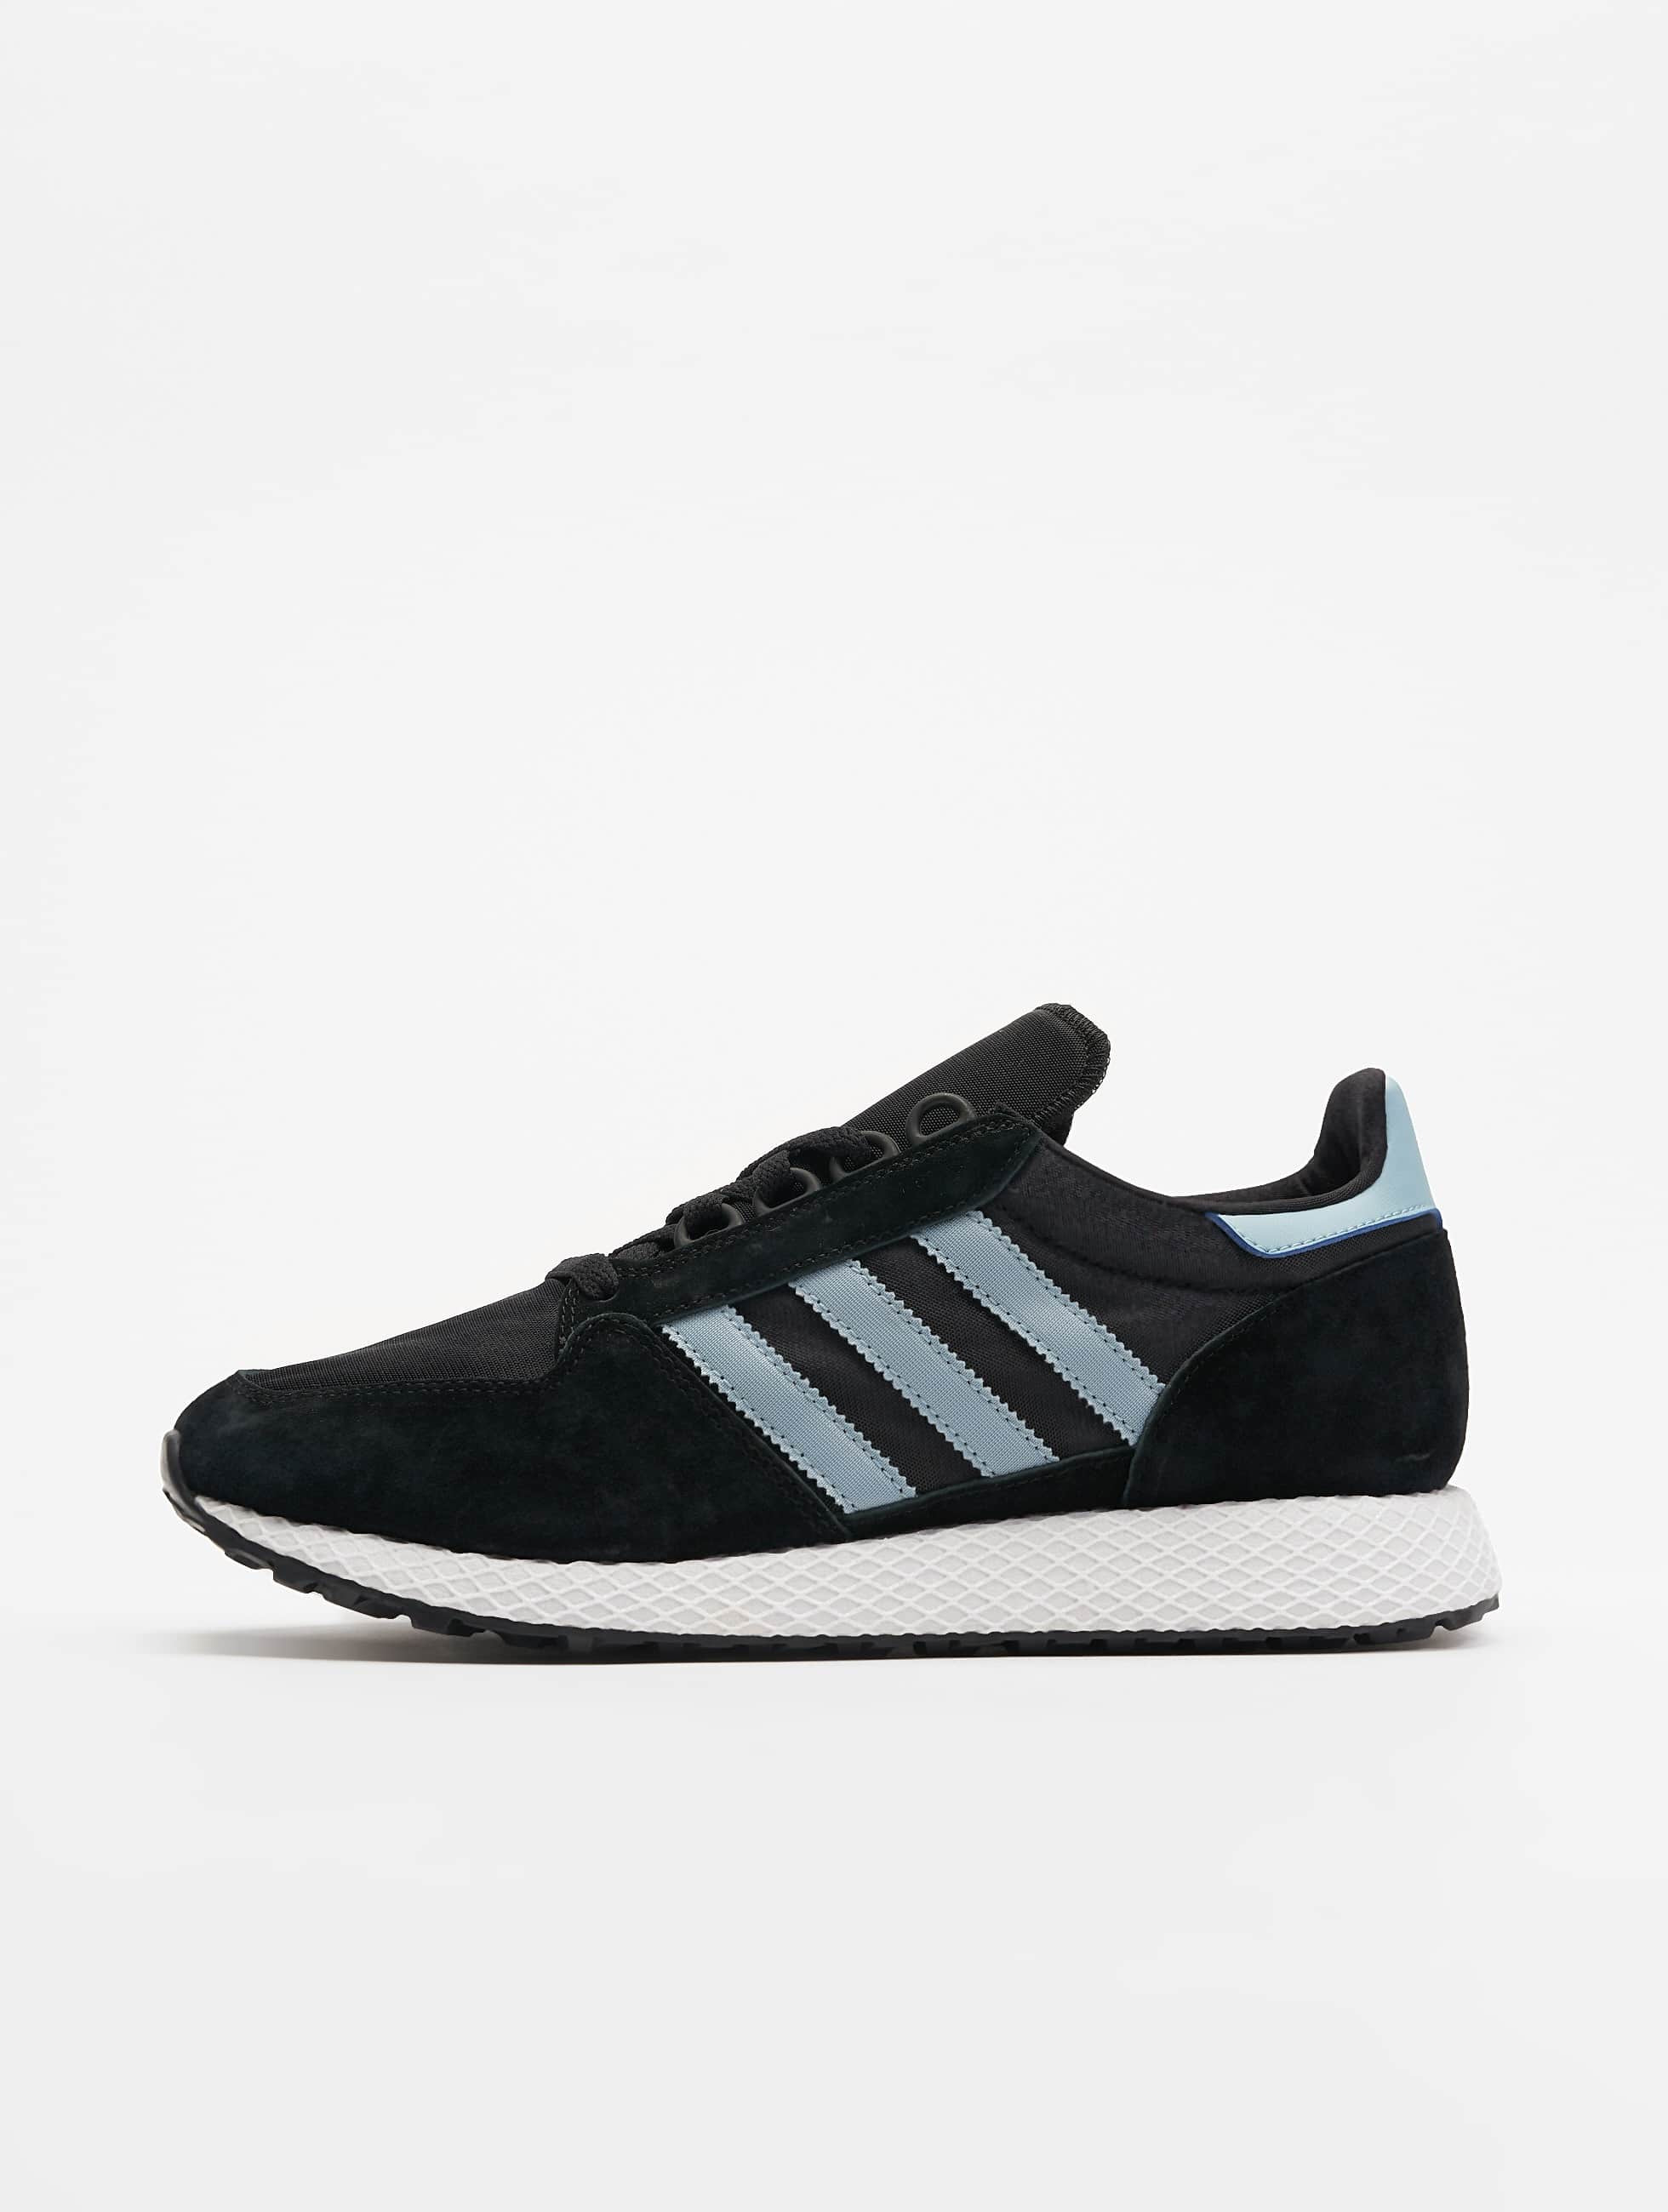 Adidas Originals Forest Grove W Sneakers Core Black